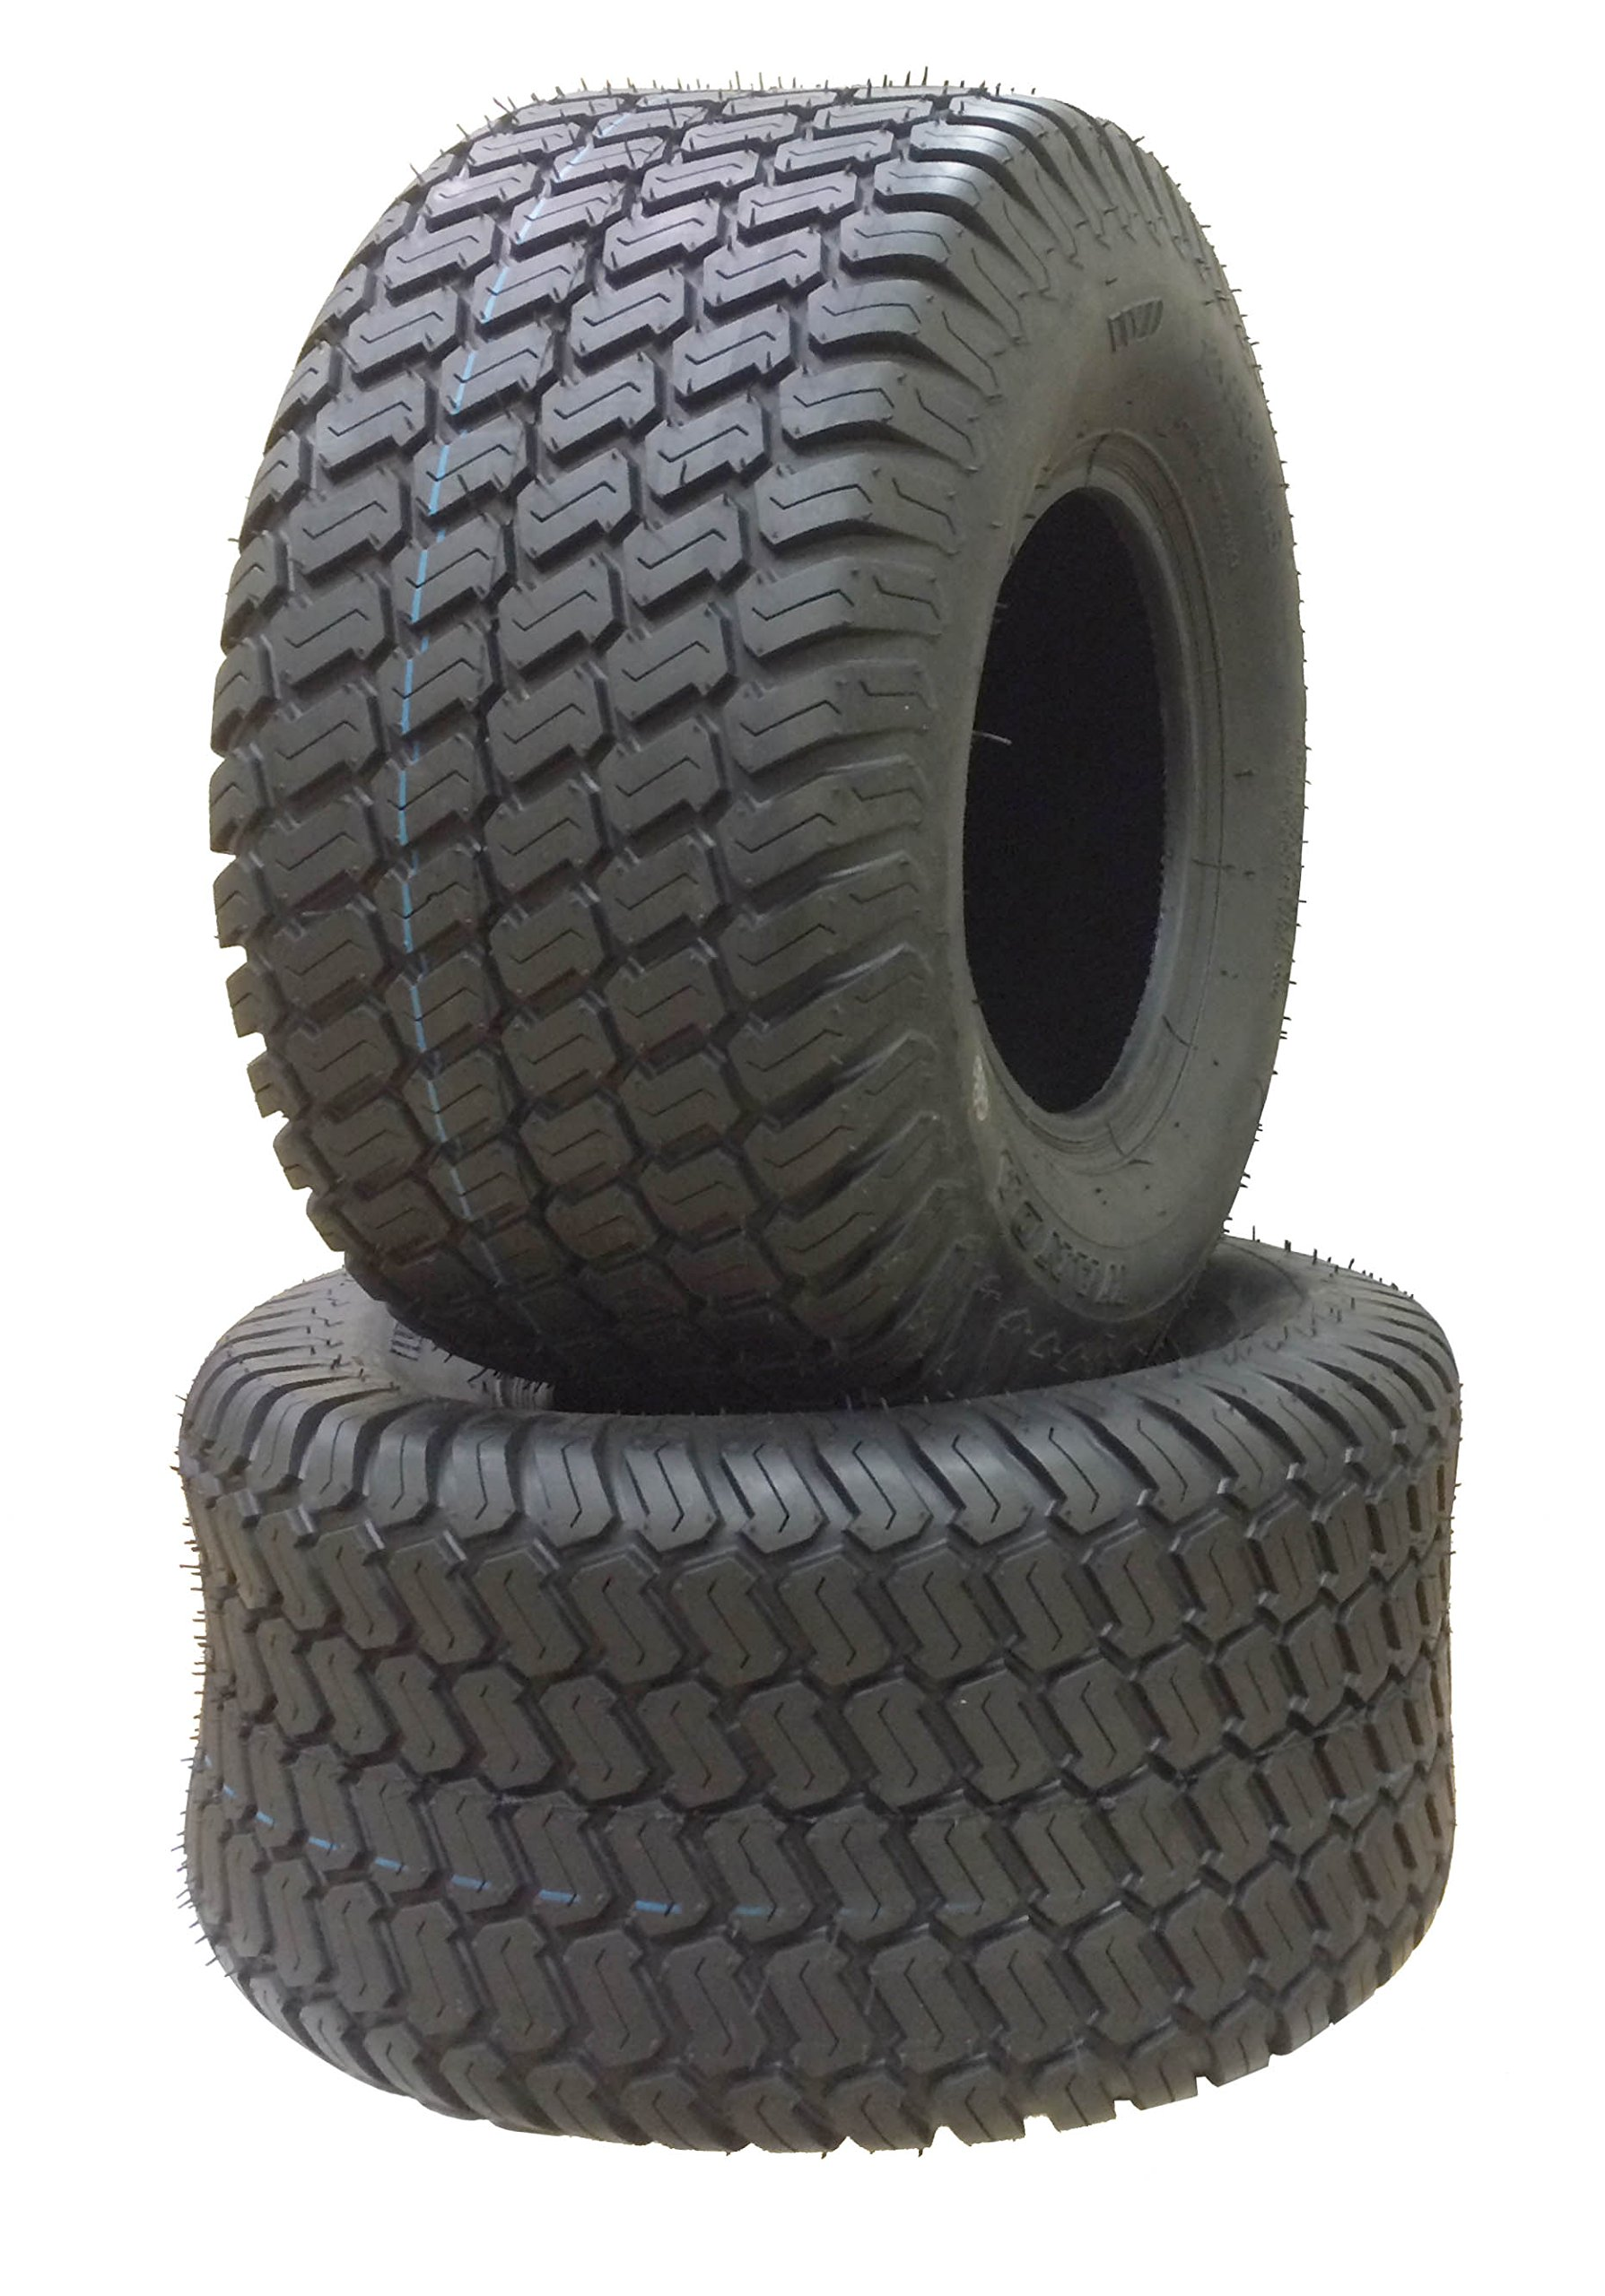 2 New 18x9.50-8 Lawn Mower Utility Cart Turf Tires P332 -13032 by Wanda